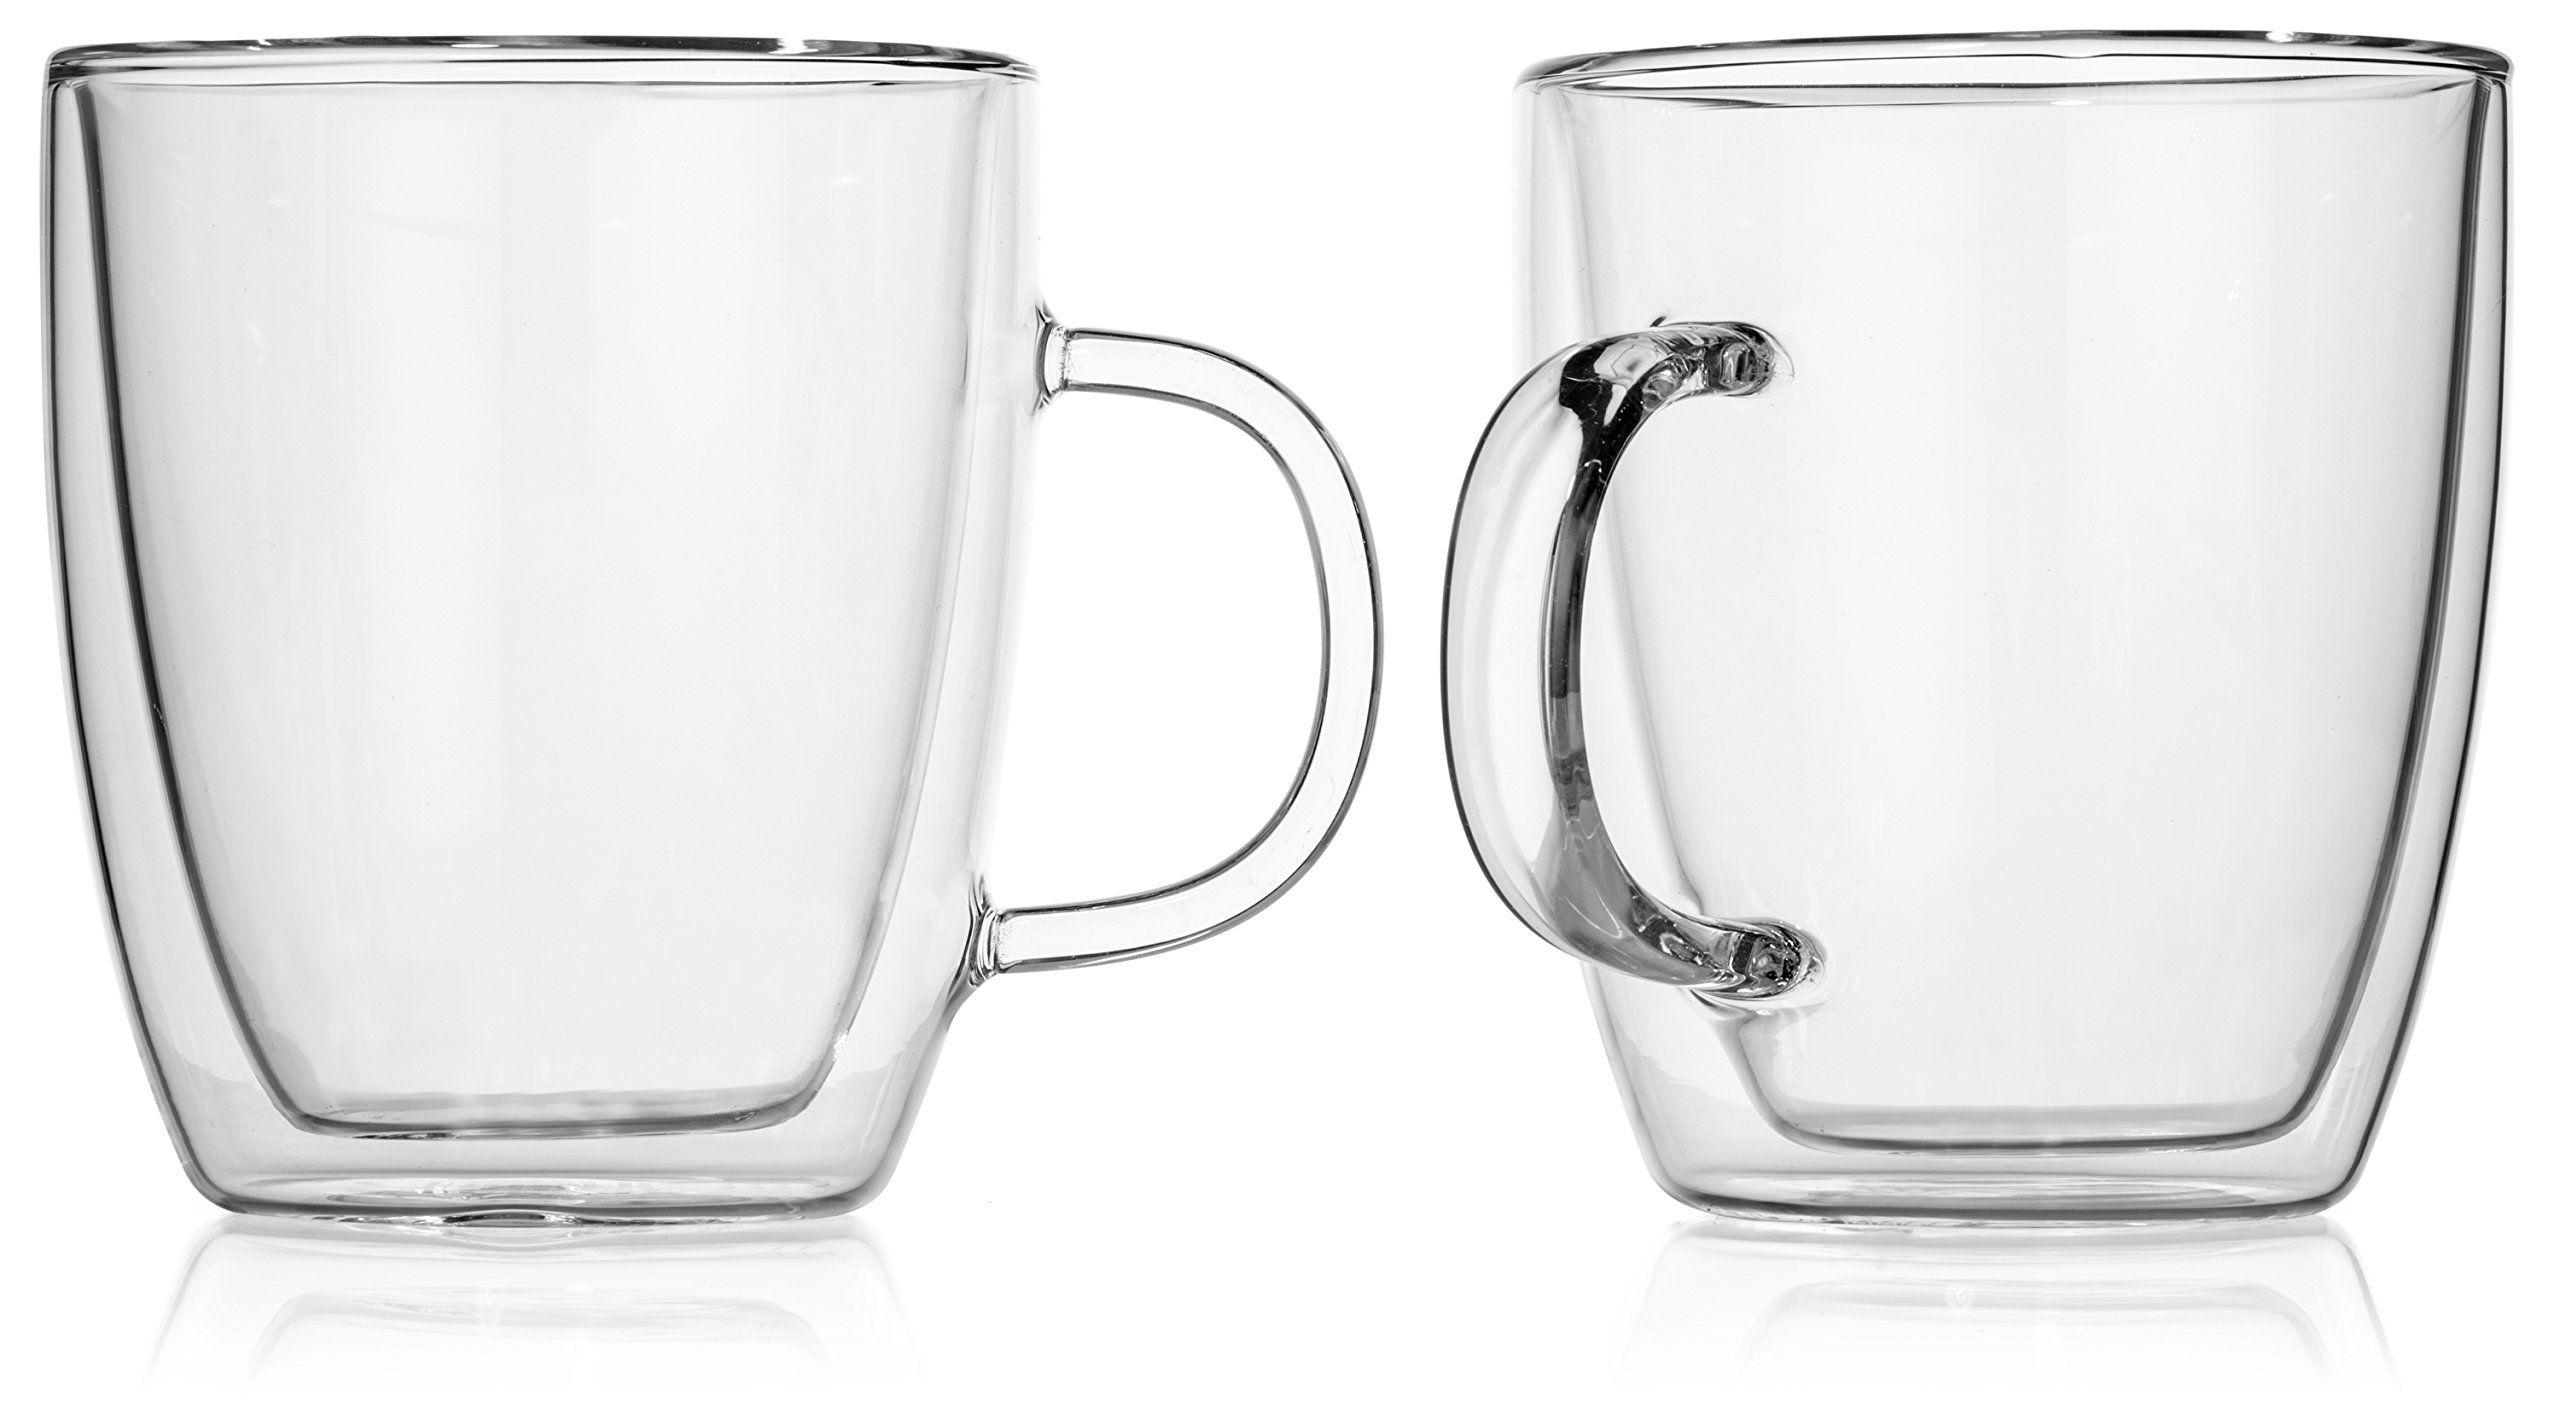 Hudson Essentials Double Wall Insulated Glass Coffee Mug